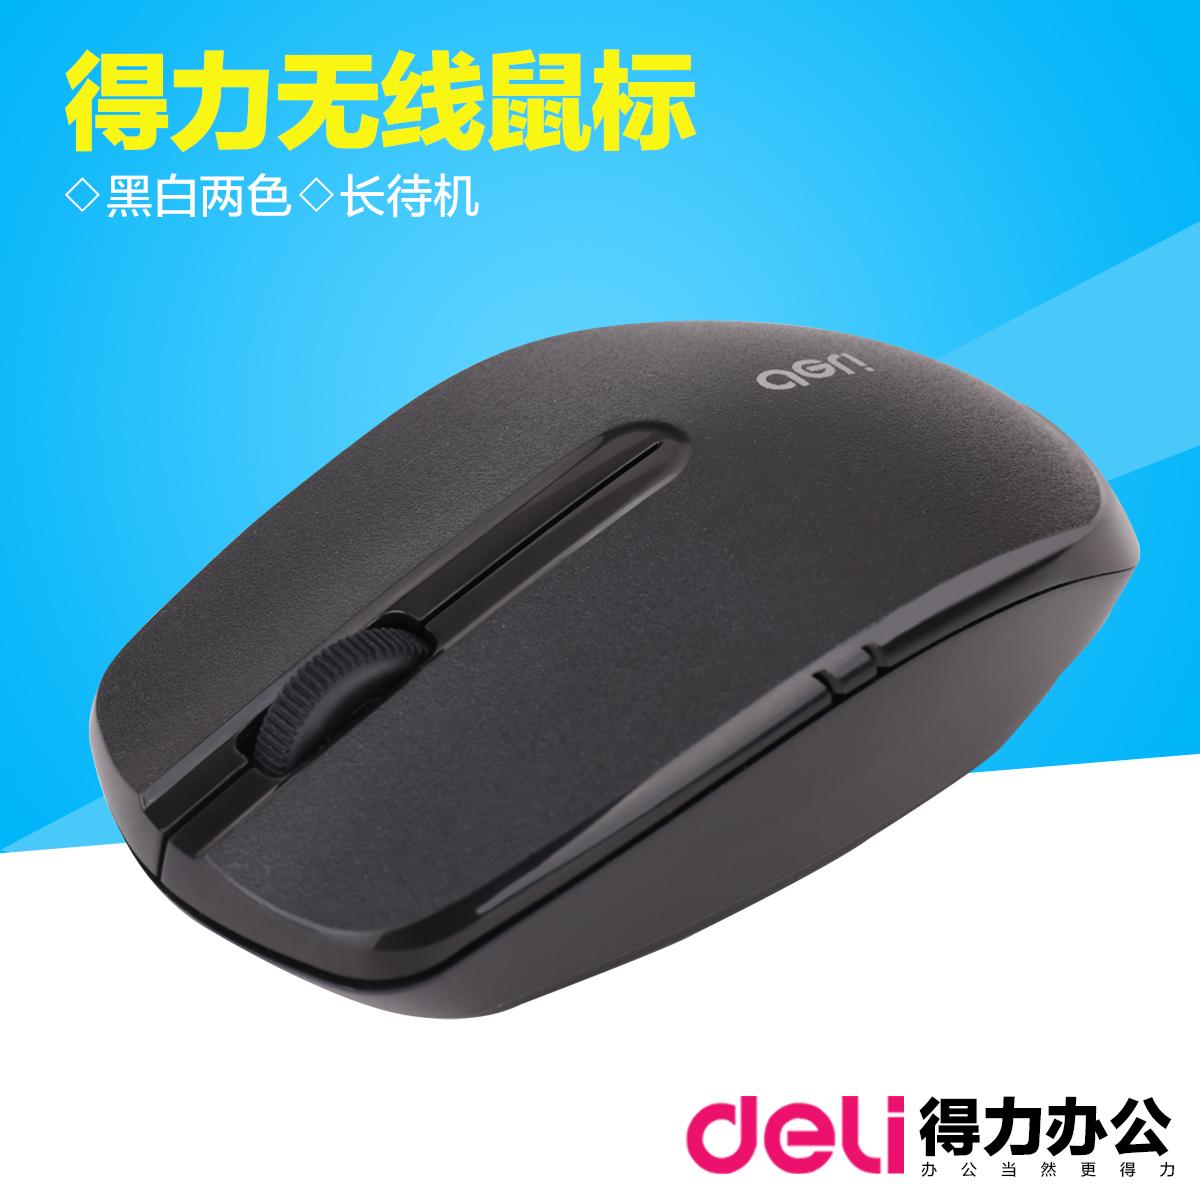 Coussin chauffant USB Deli entreprise - Ref 421613 Image 1